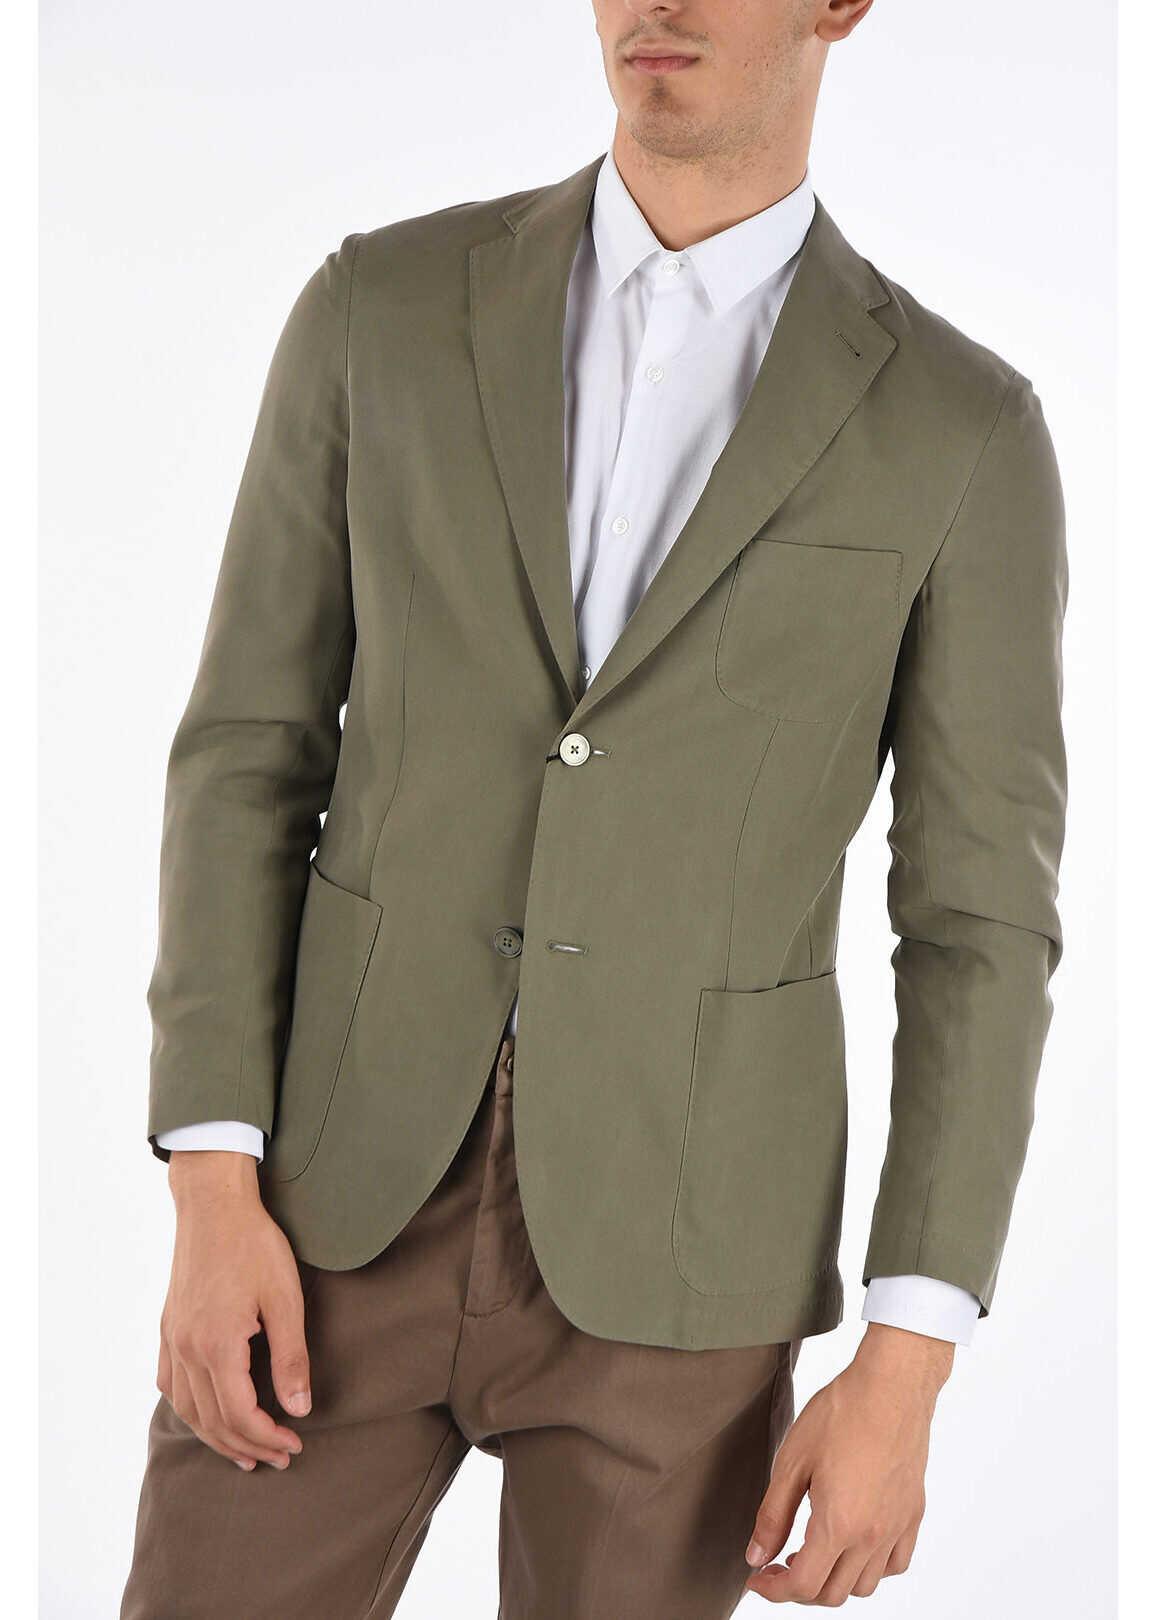 CORNELIANI ID silk IDENTITY 2-button blazer BEIGE imagine